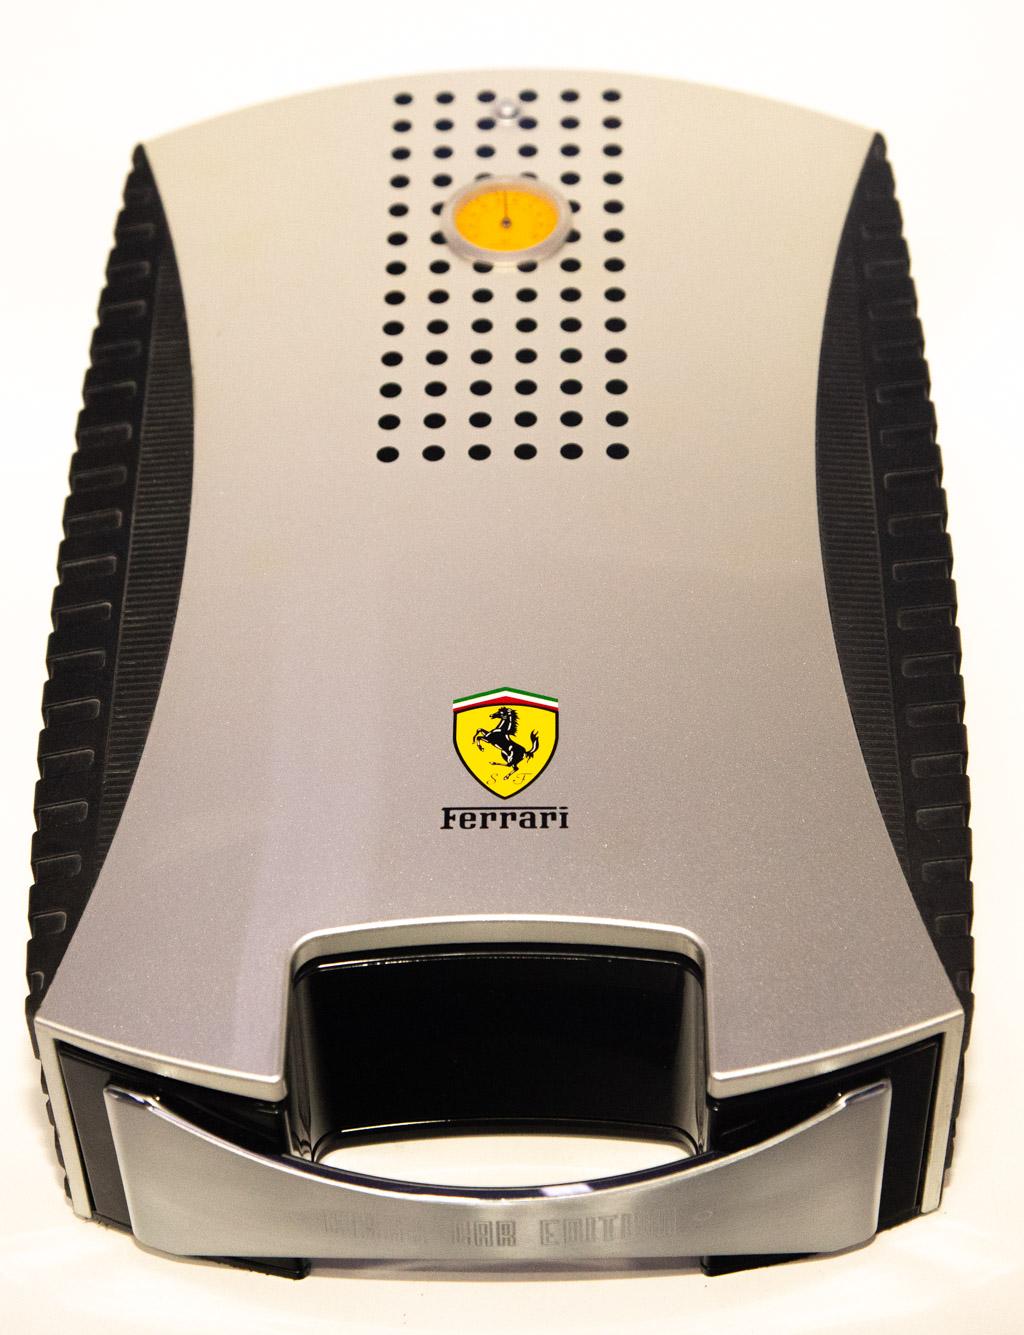 Caixa Umidora Ferrari